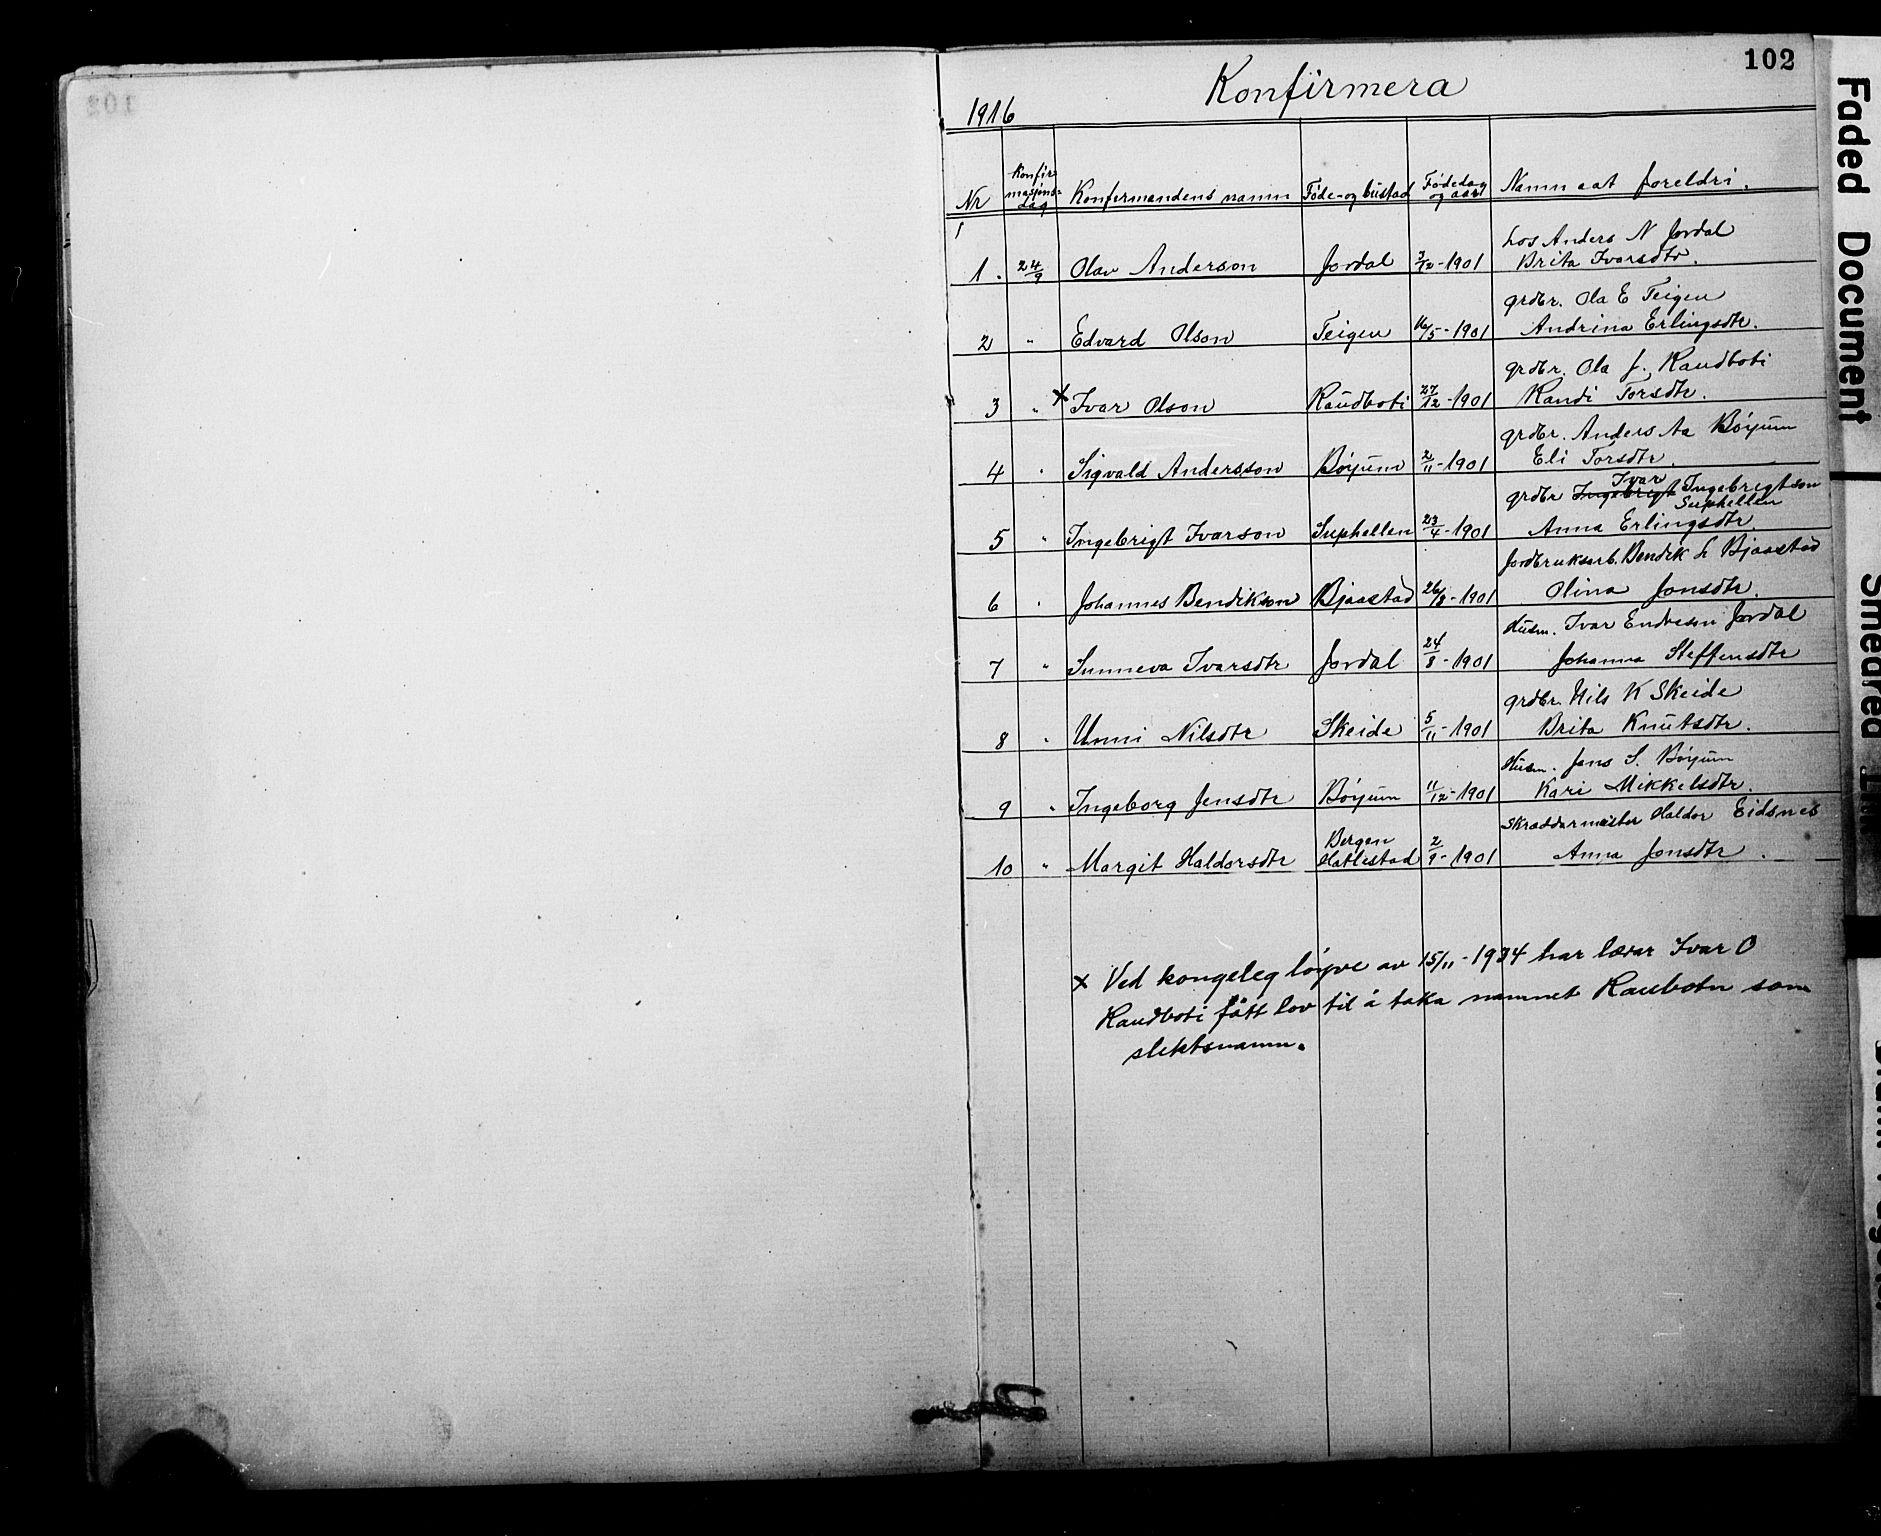 SAB, Balestrand sokneprestembete, Klokkerbok nr. B 1A, 1880-1916, s. 102